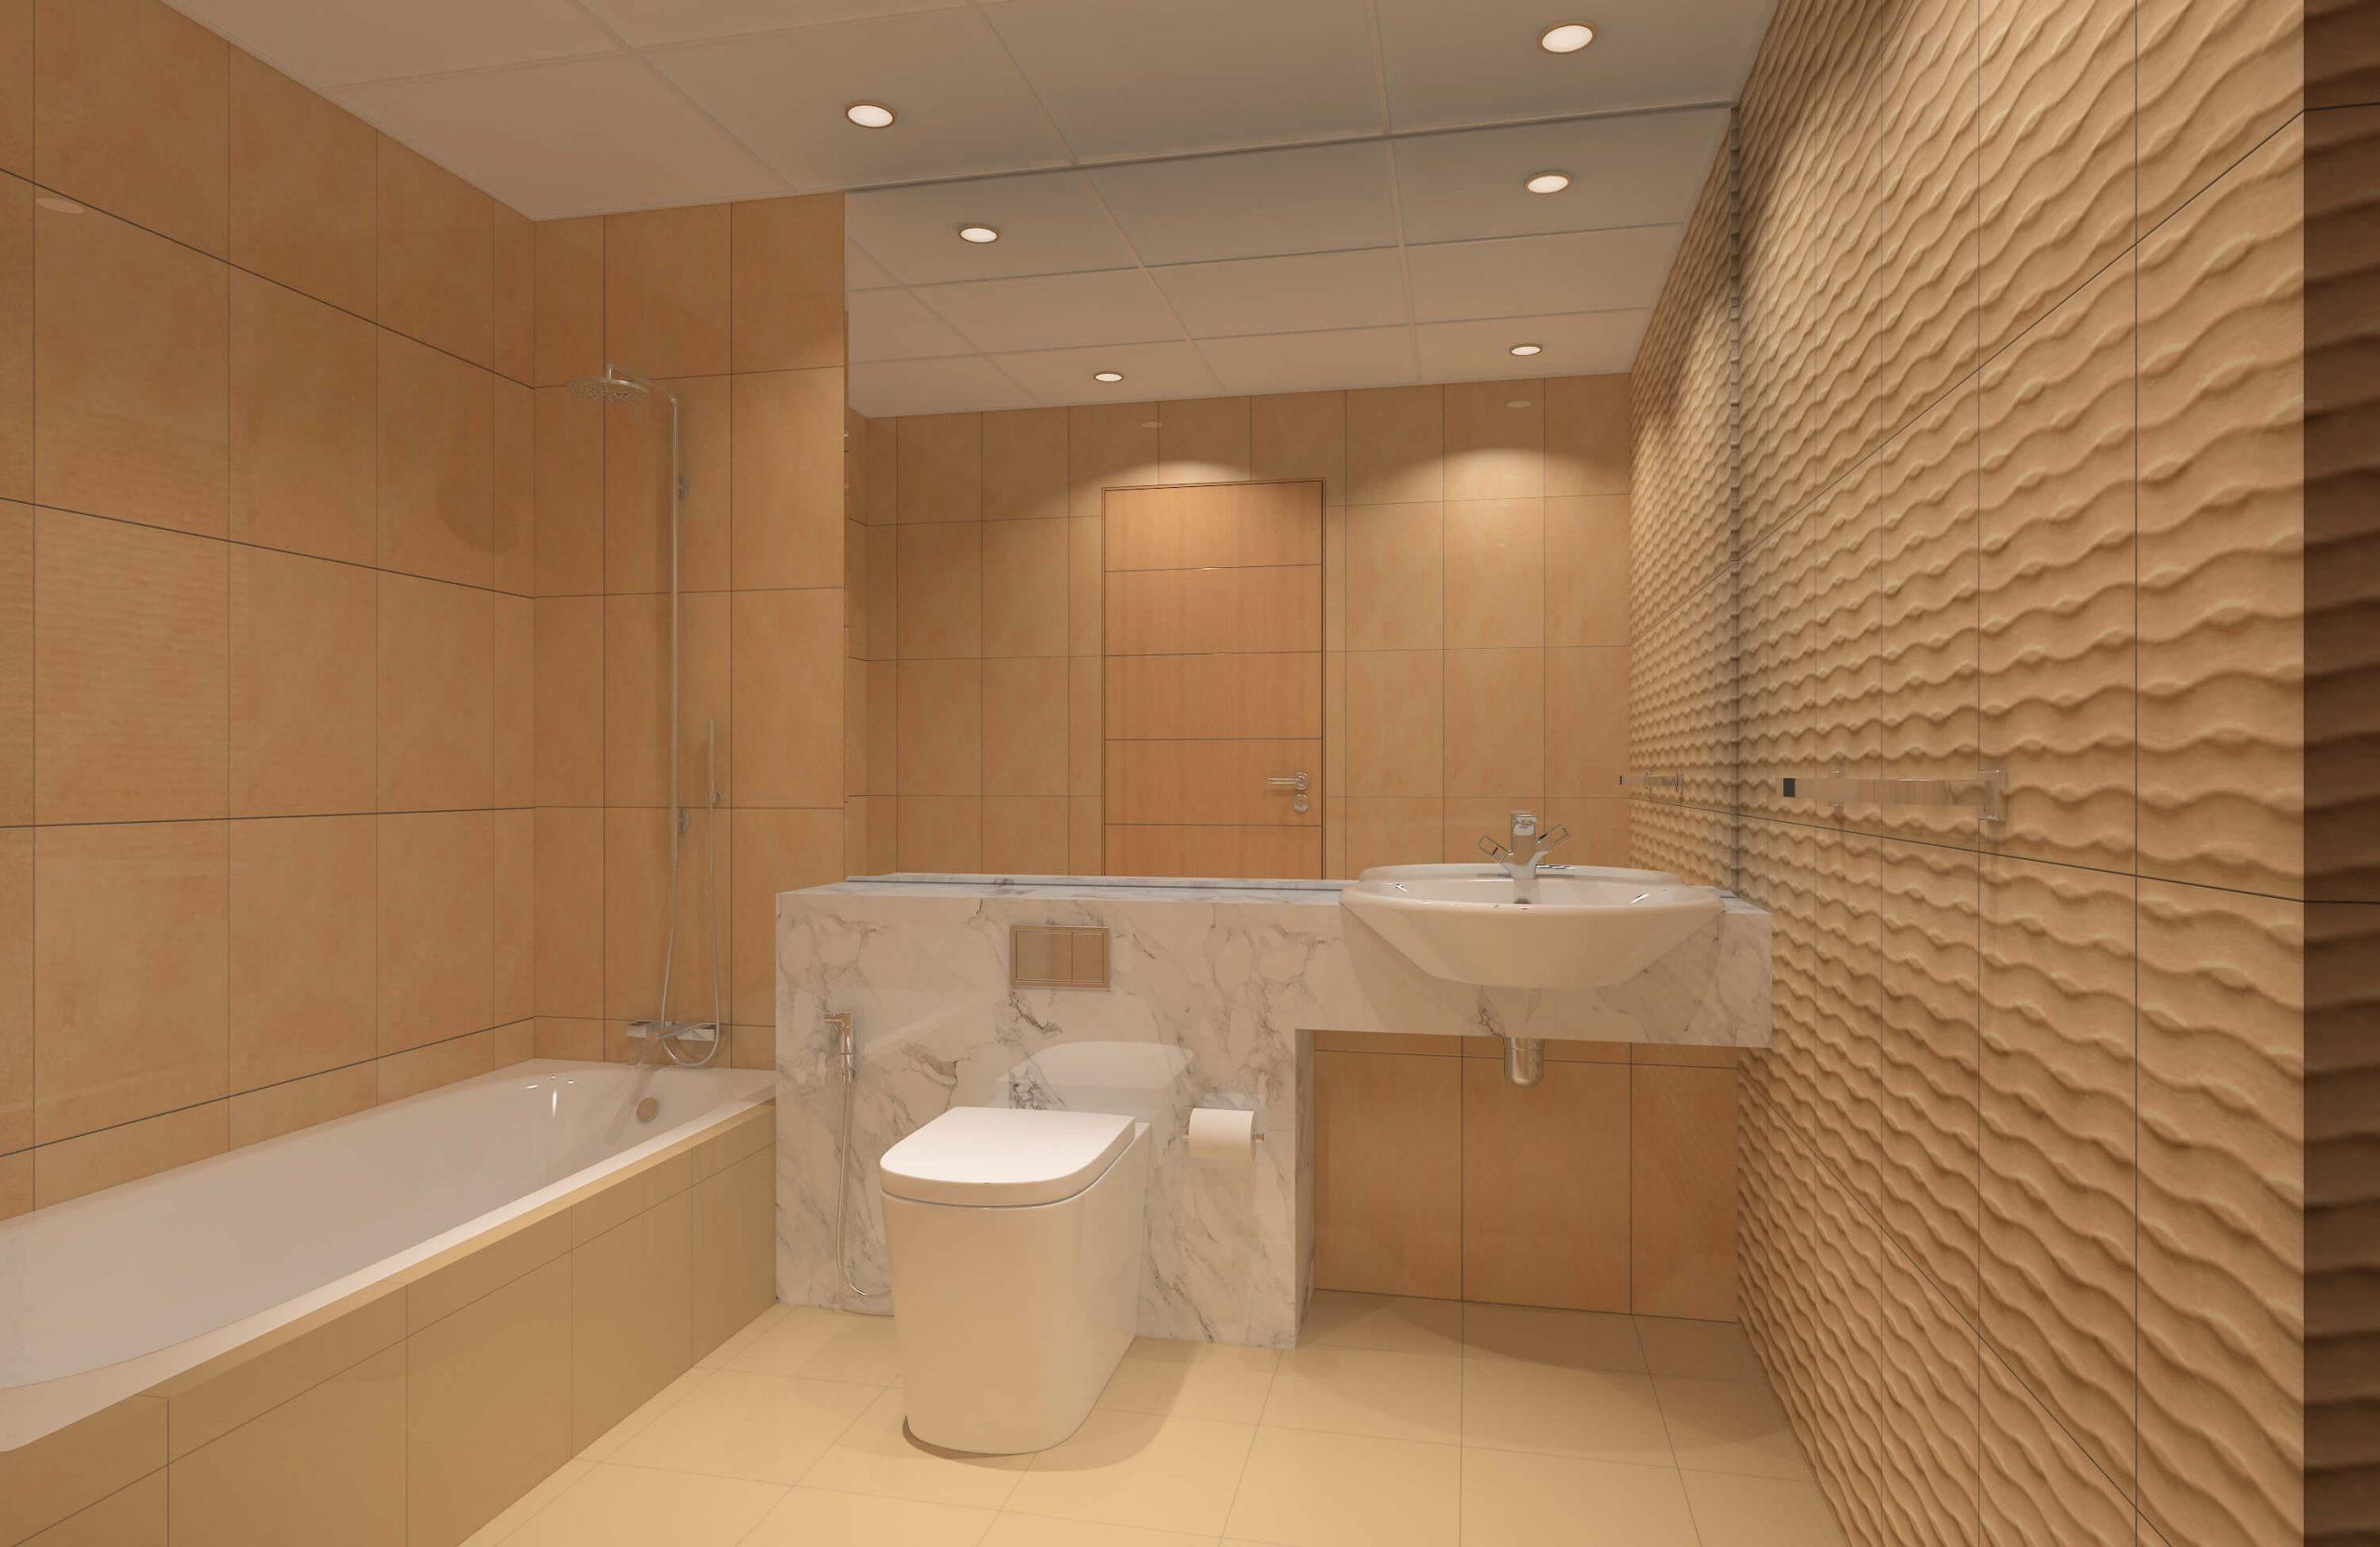 04-bath-scaled.jpg